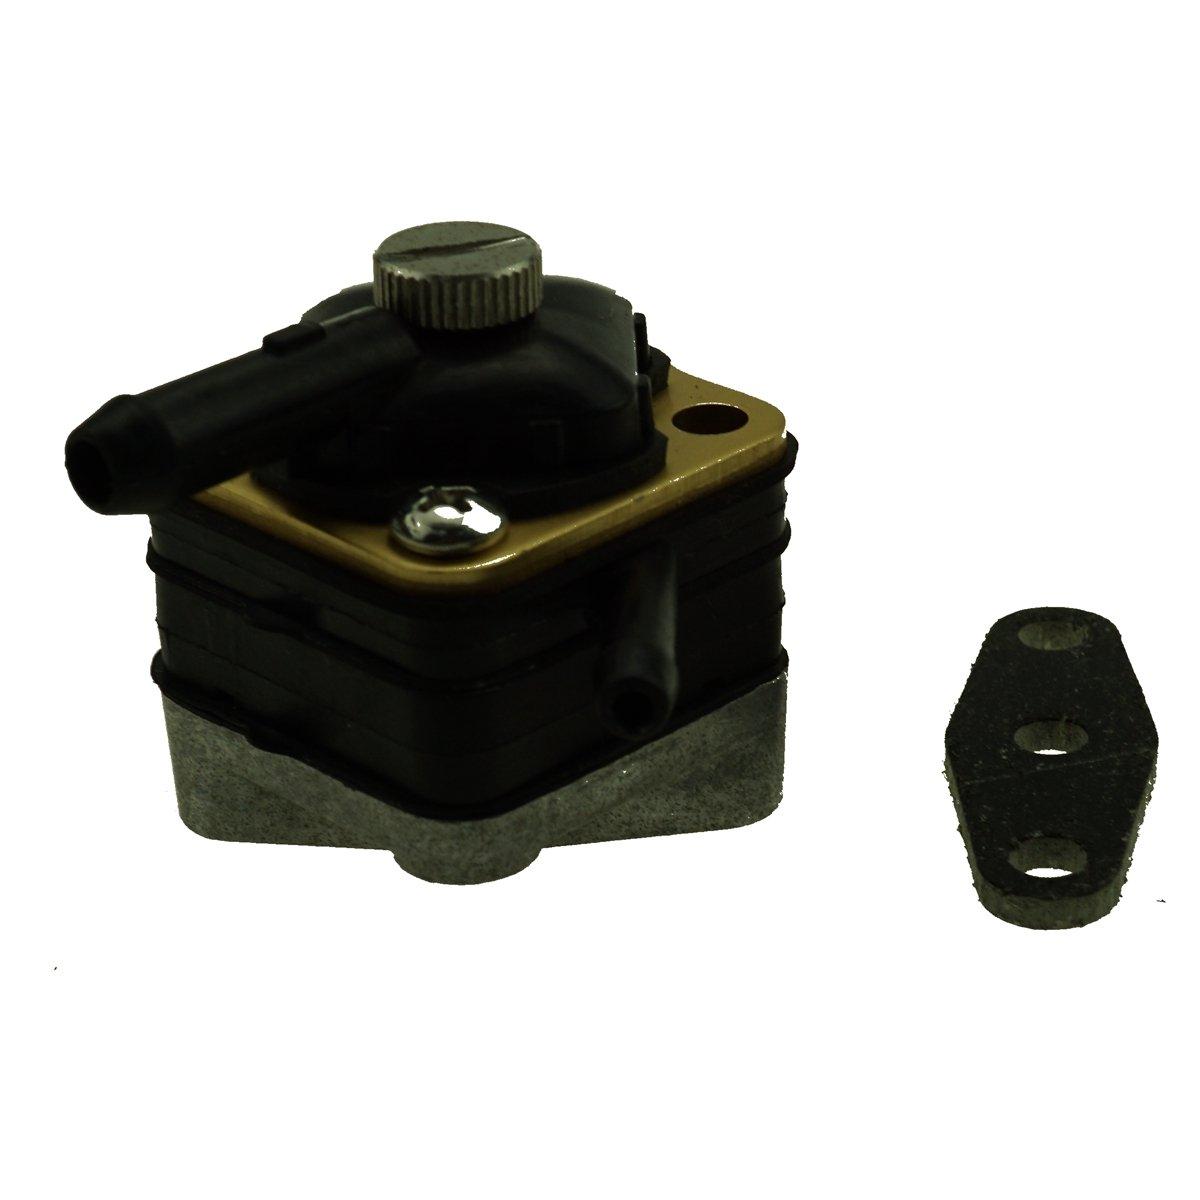 Uanofcn New Fuel Pump for Johnson Evinrude 6 8 9.9 /& 15 hp Thru 397839 395091 18-7350